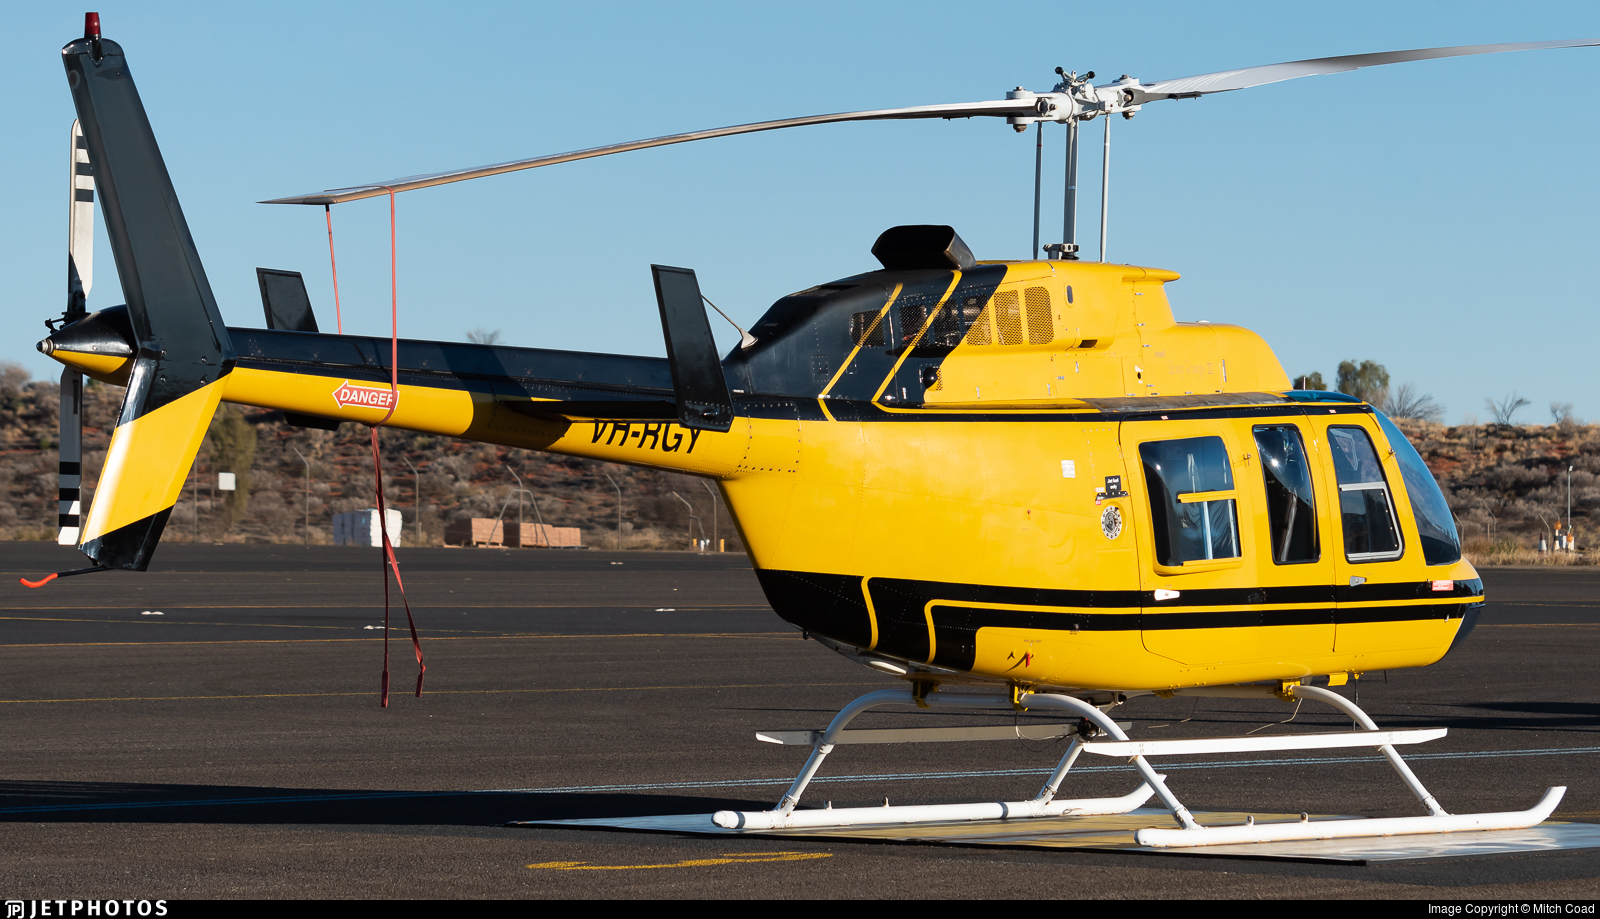 VH-RGY - Bell 206L-3 LongRanger III - Private